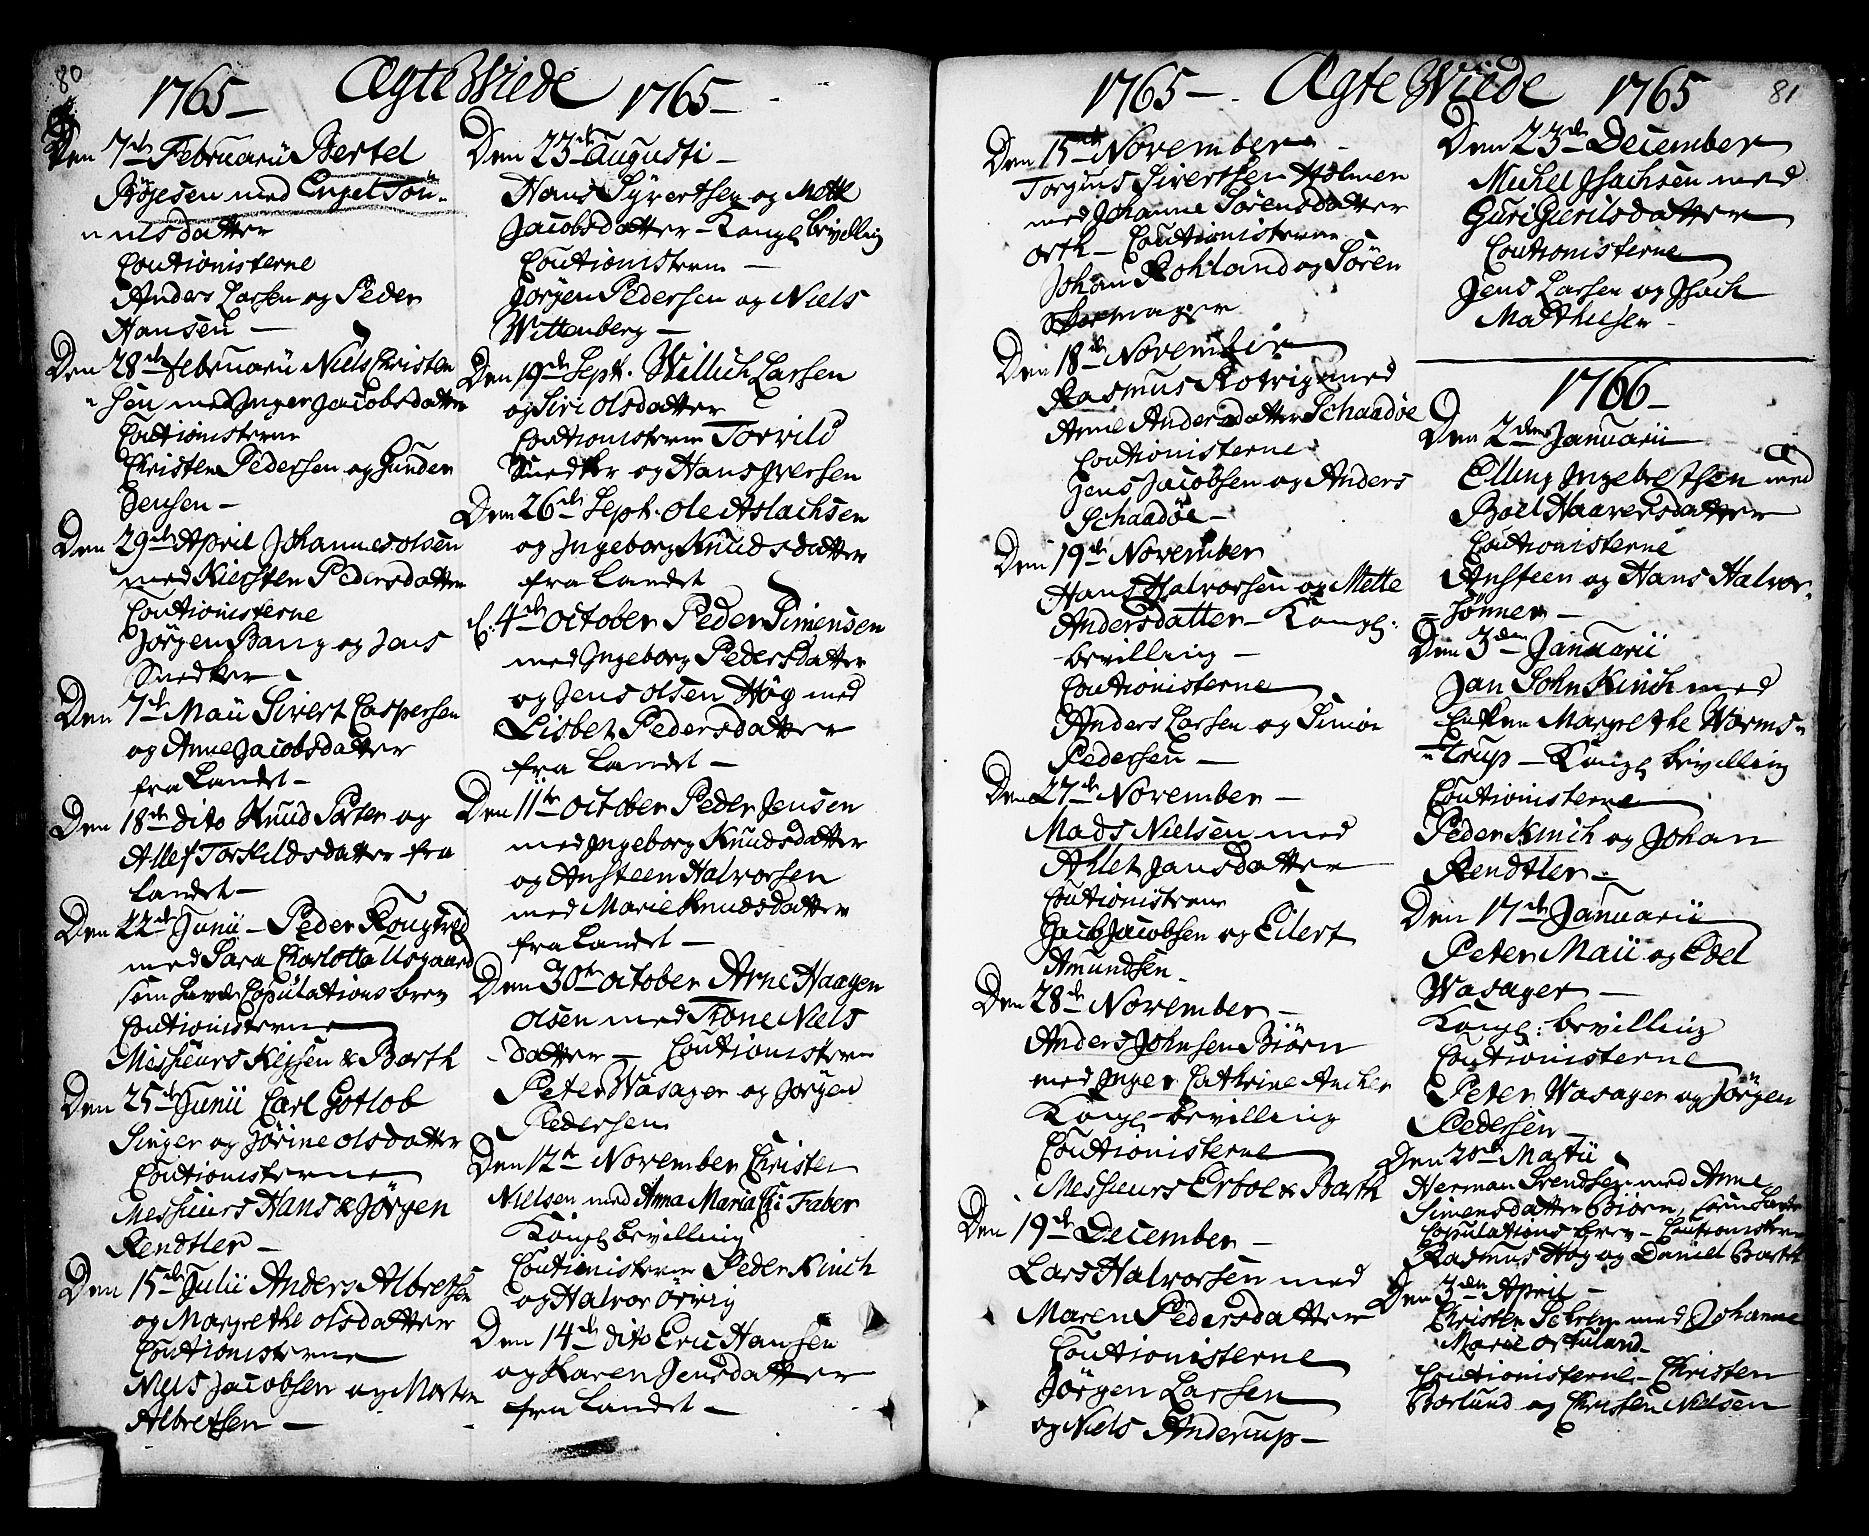 SAKO, Kragerø kirkebøker, F/Fa/L0001: Ministerialbok nr. 1, 1702-1766, s. 80-81